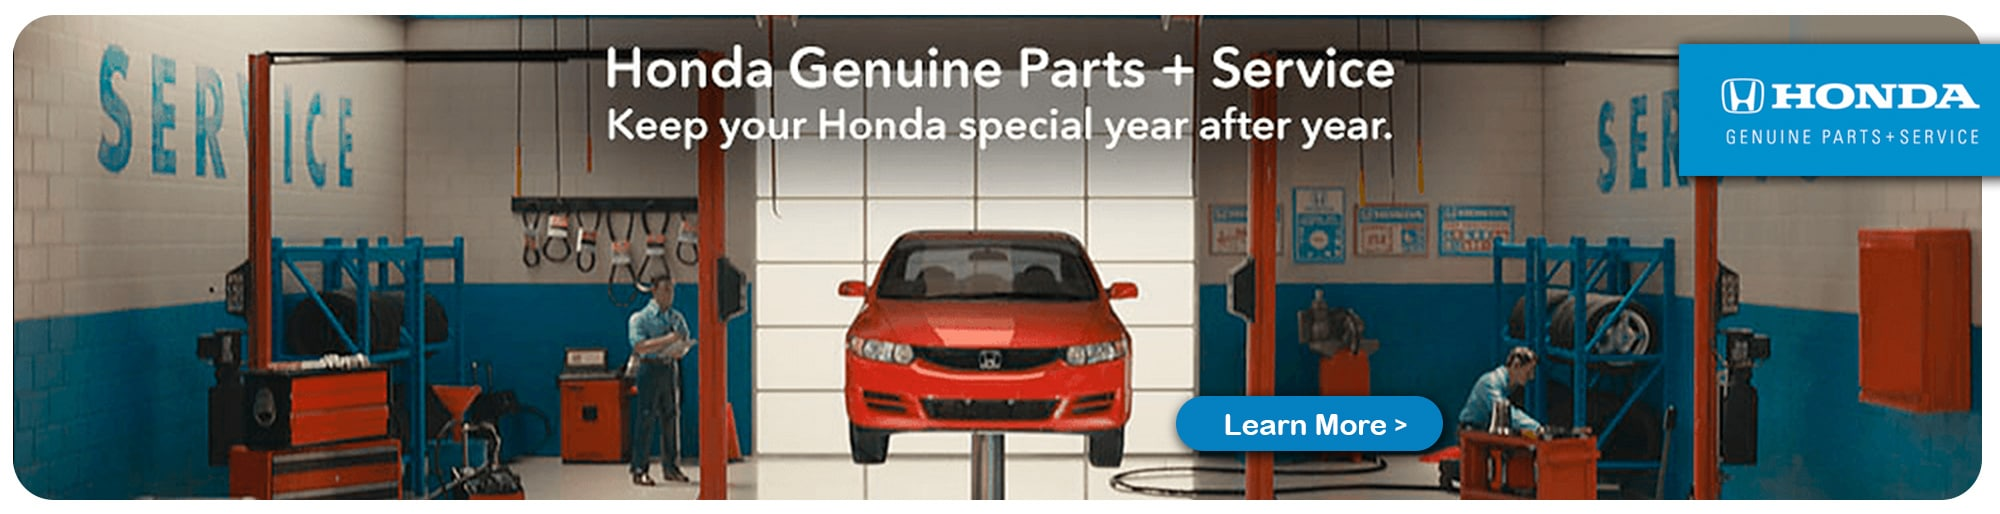 Honda Dealer San Francisco Ca New Used Car Near Sf Bay Area 2001 Crv Parts Oem Previous Next